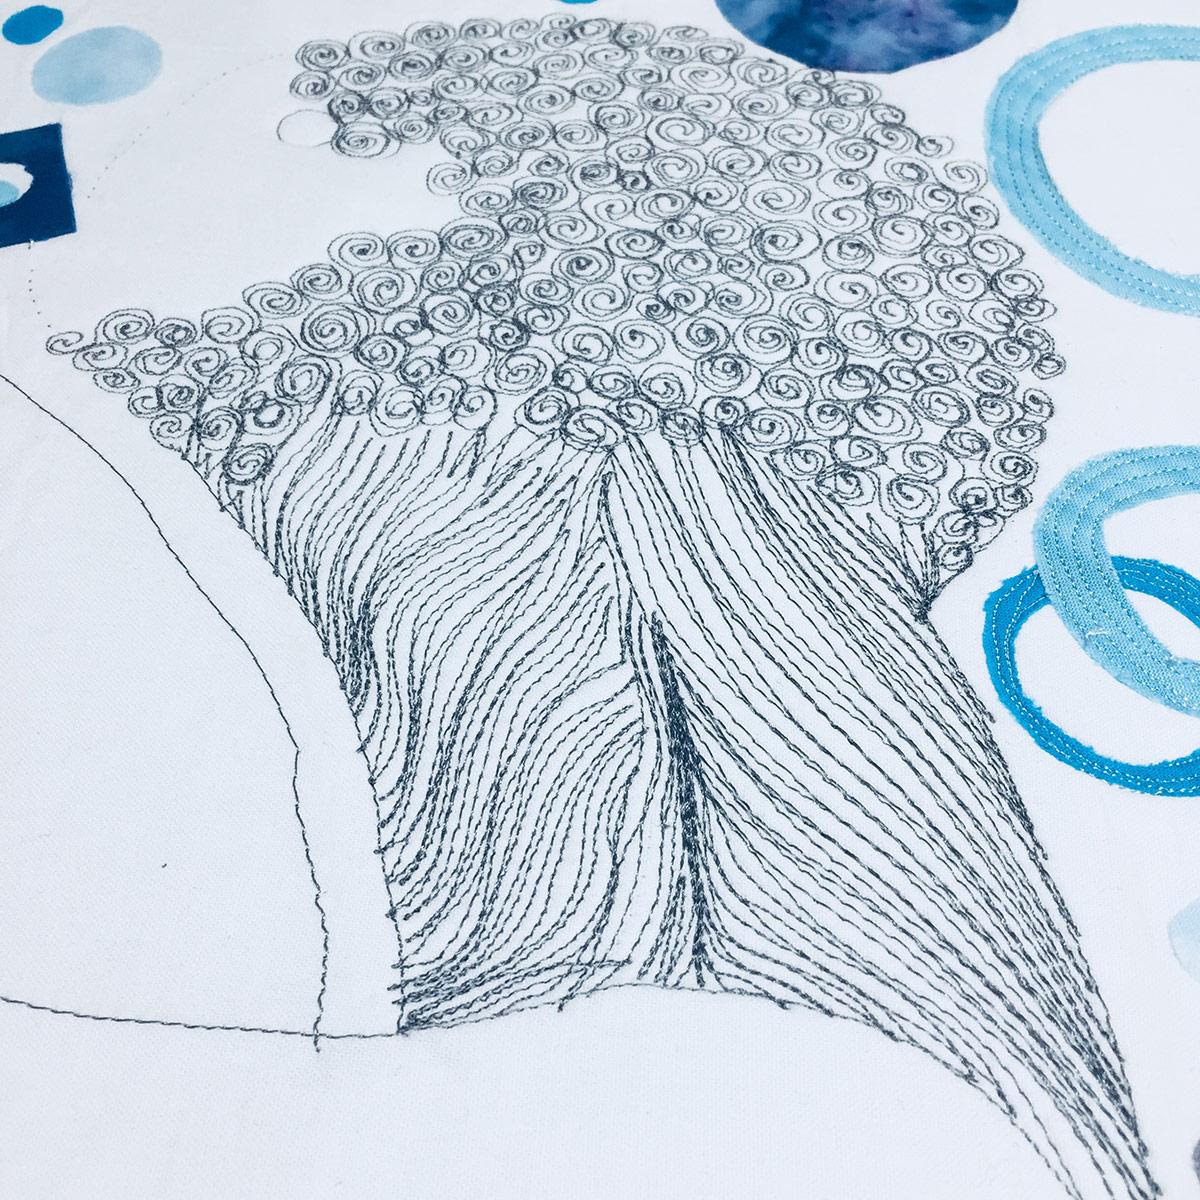 Thread Sketching|Motivation|Discipline